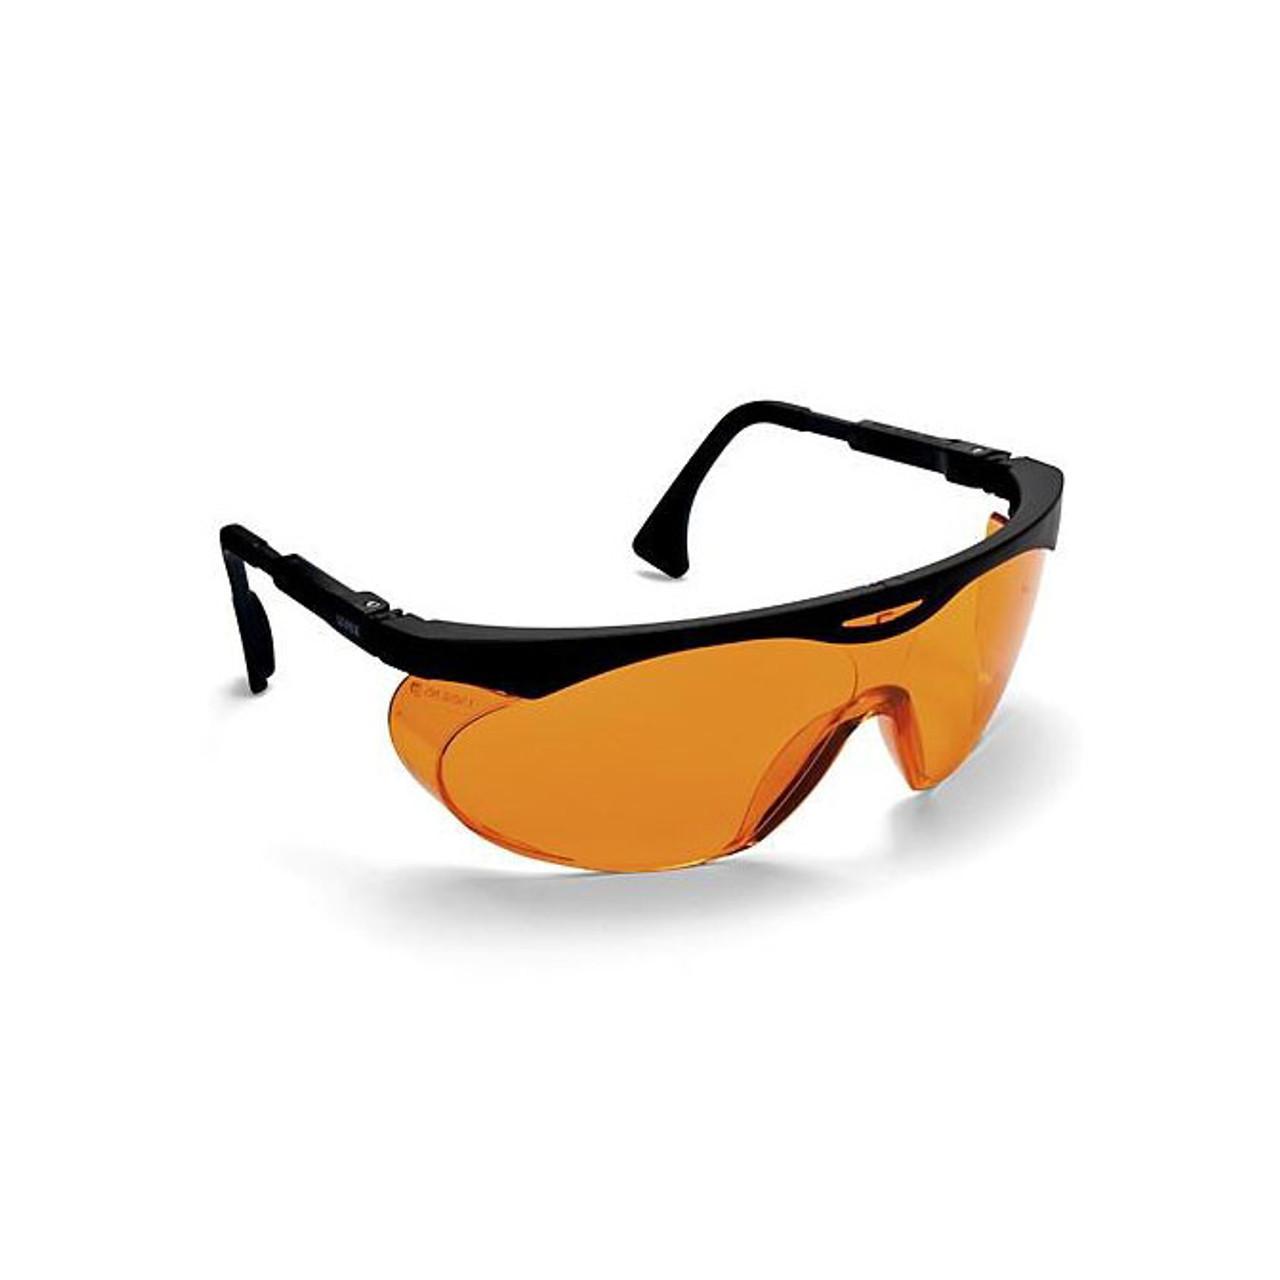 e3b0708235 UVEX Blue Light Blocking Glasses - Standard Fit